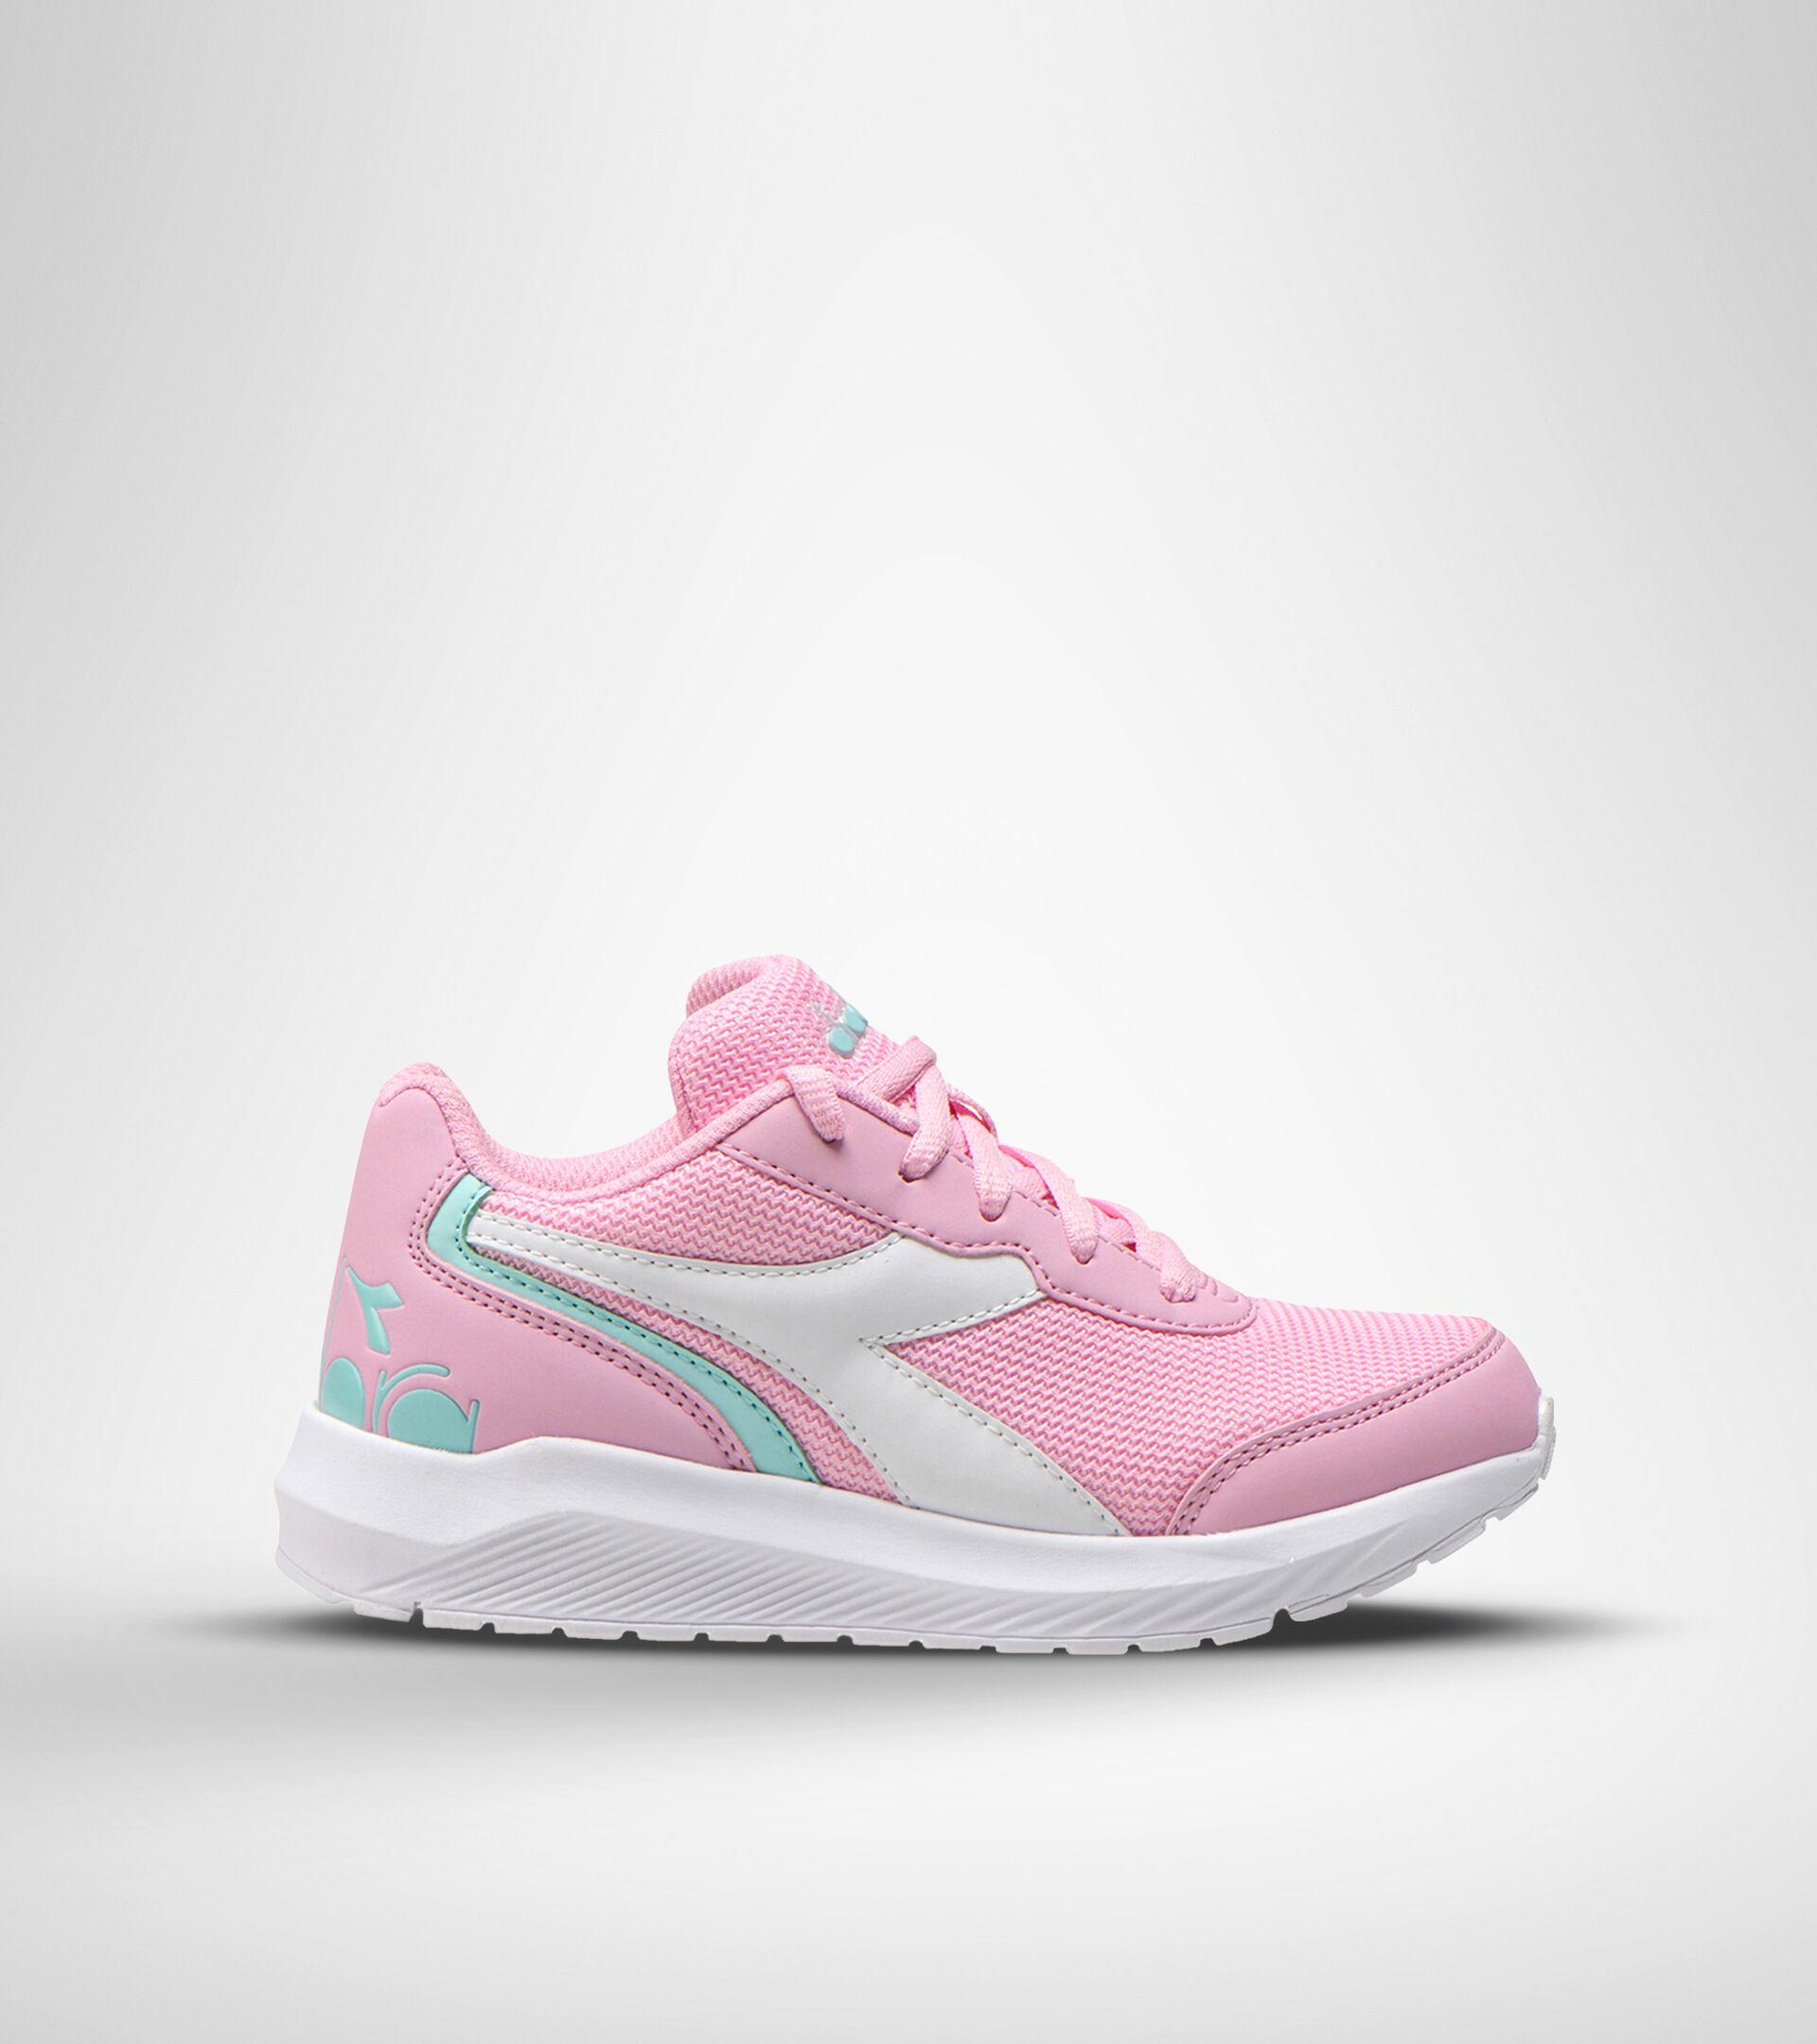 Chaussures de running - Unisexe Enfant FALCON JR ROSA LADY/BIANCO - Diadora